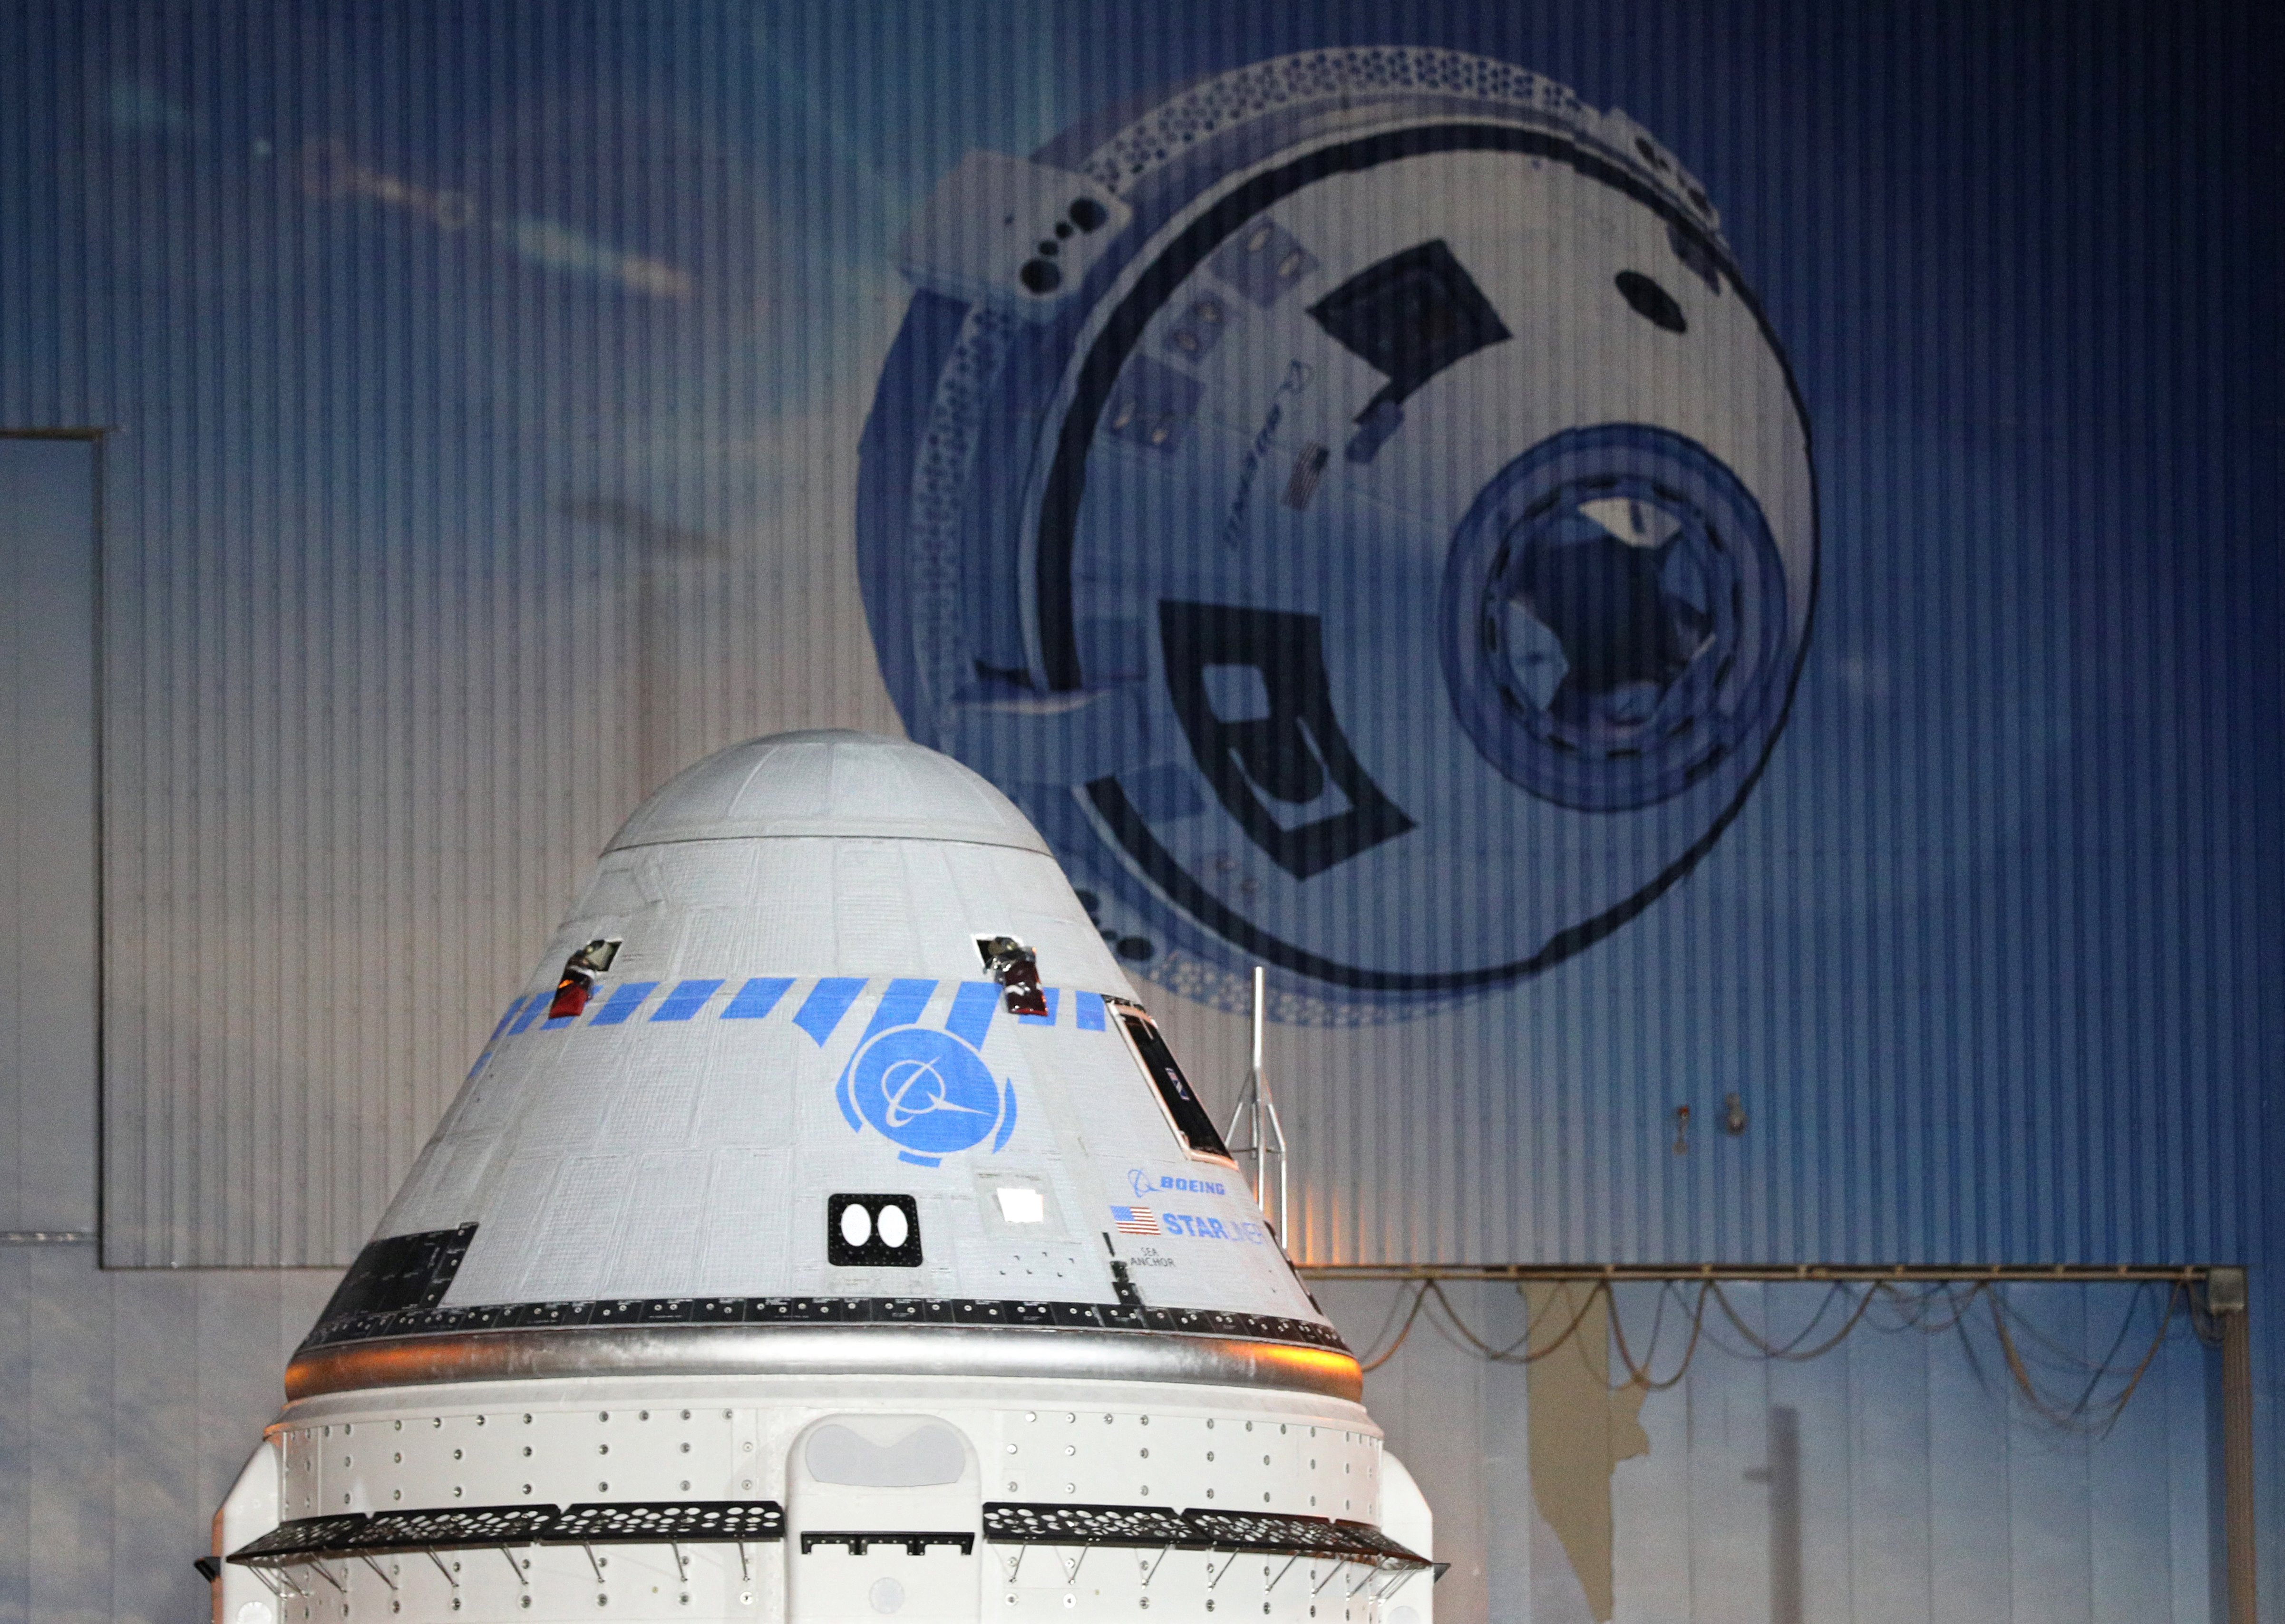 US-SPACE-BOEING